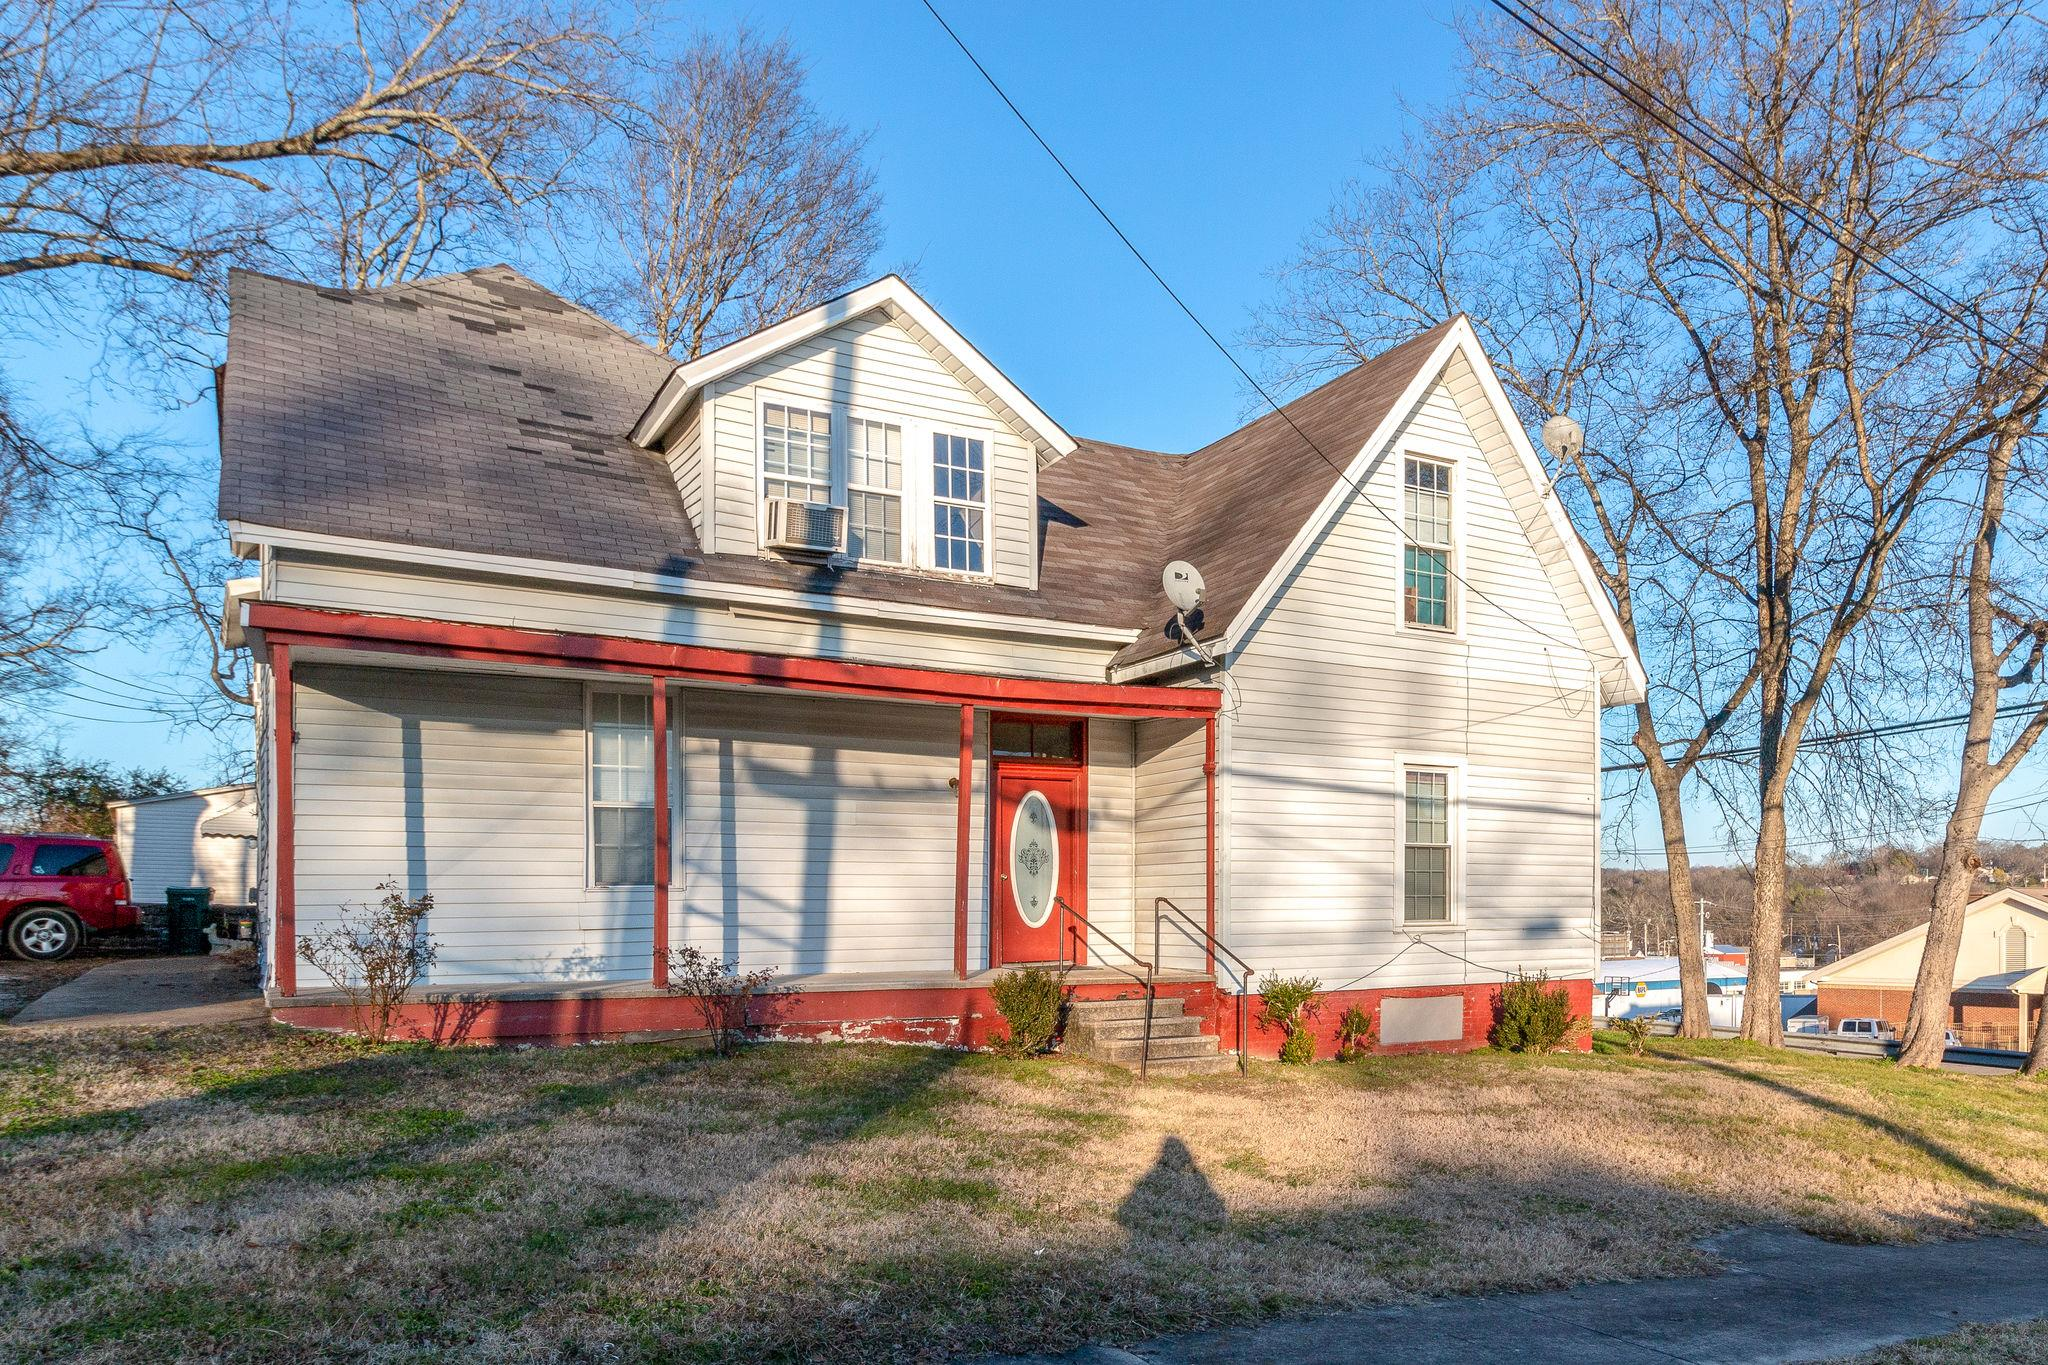 318 Washington Street, Pulaski, TN 38478 - Pulaski, TN real estate listing